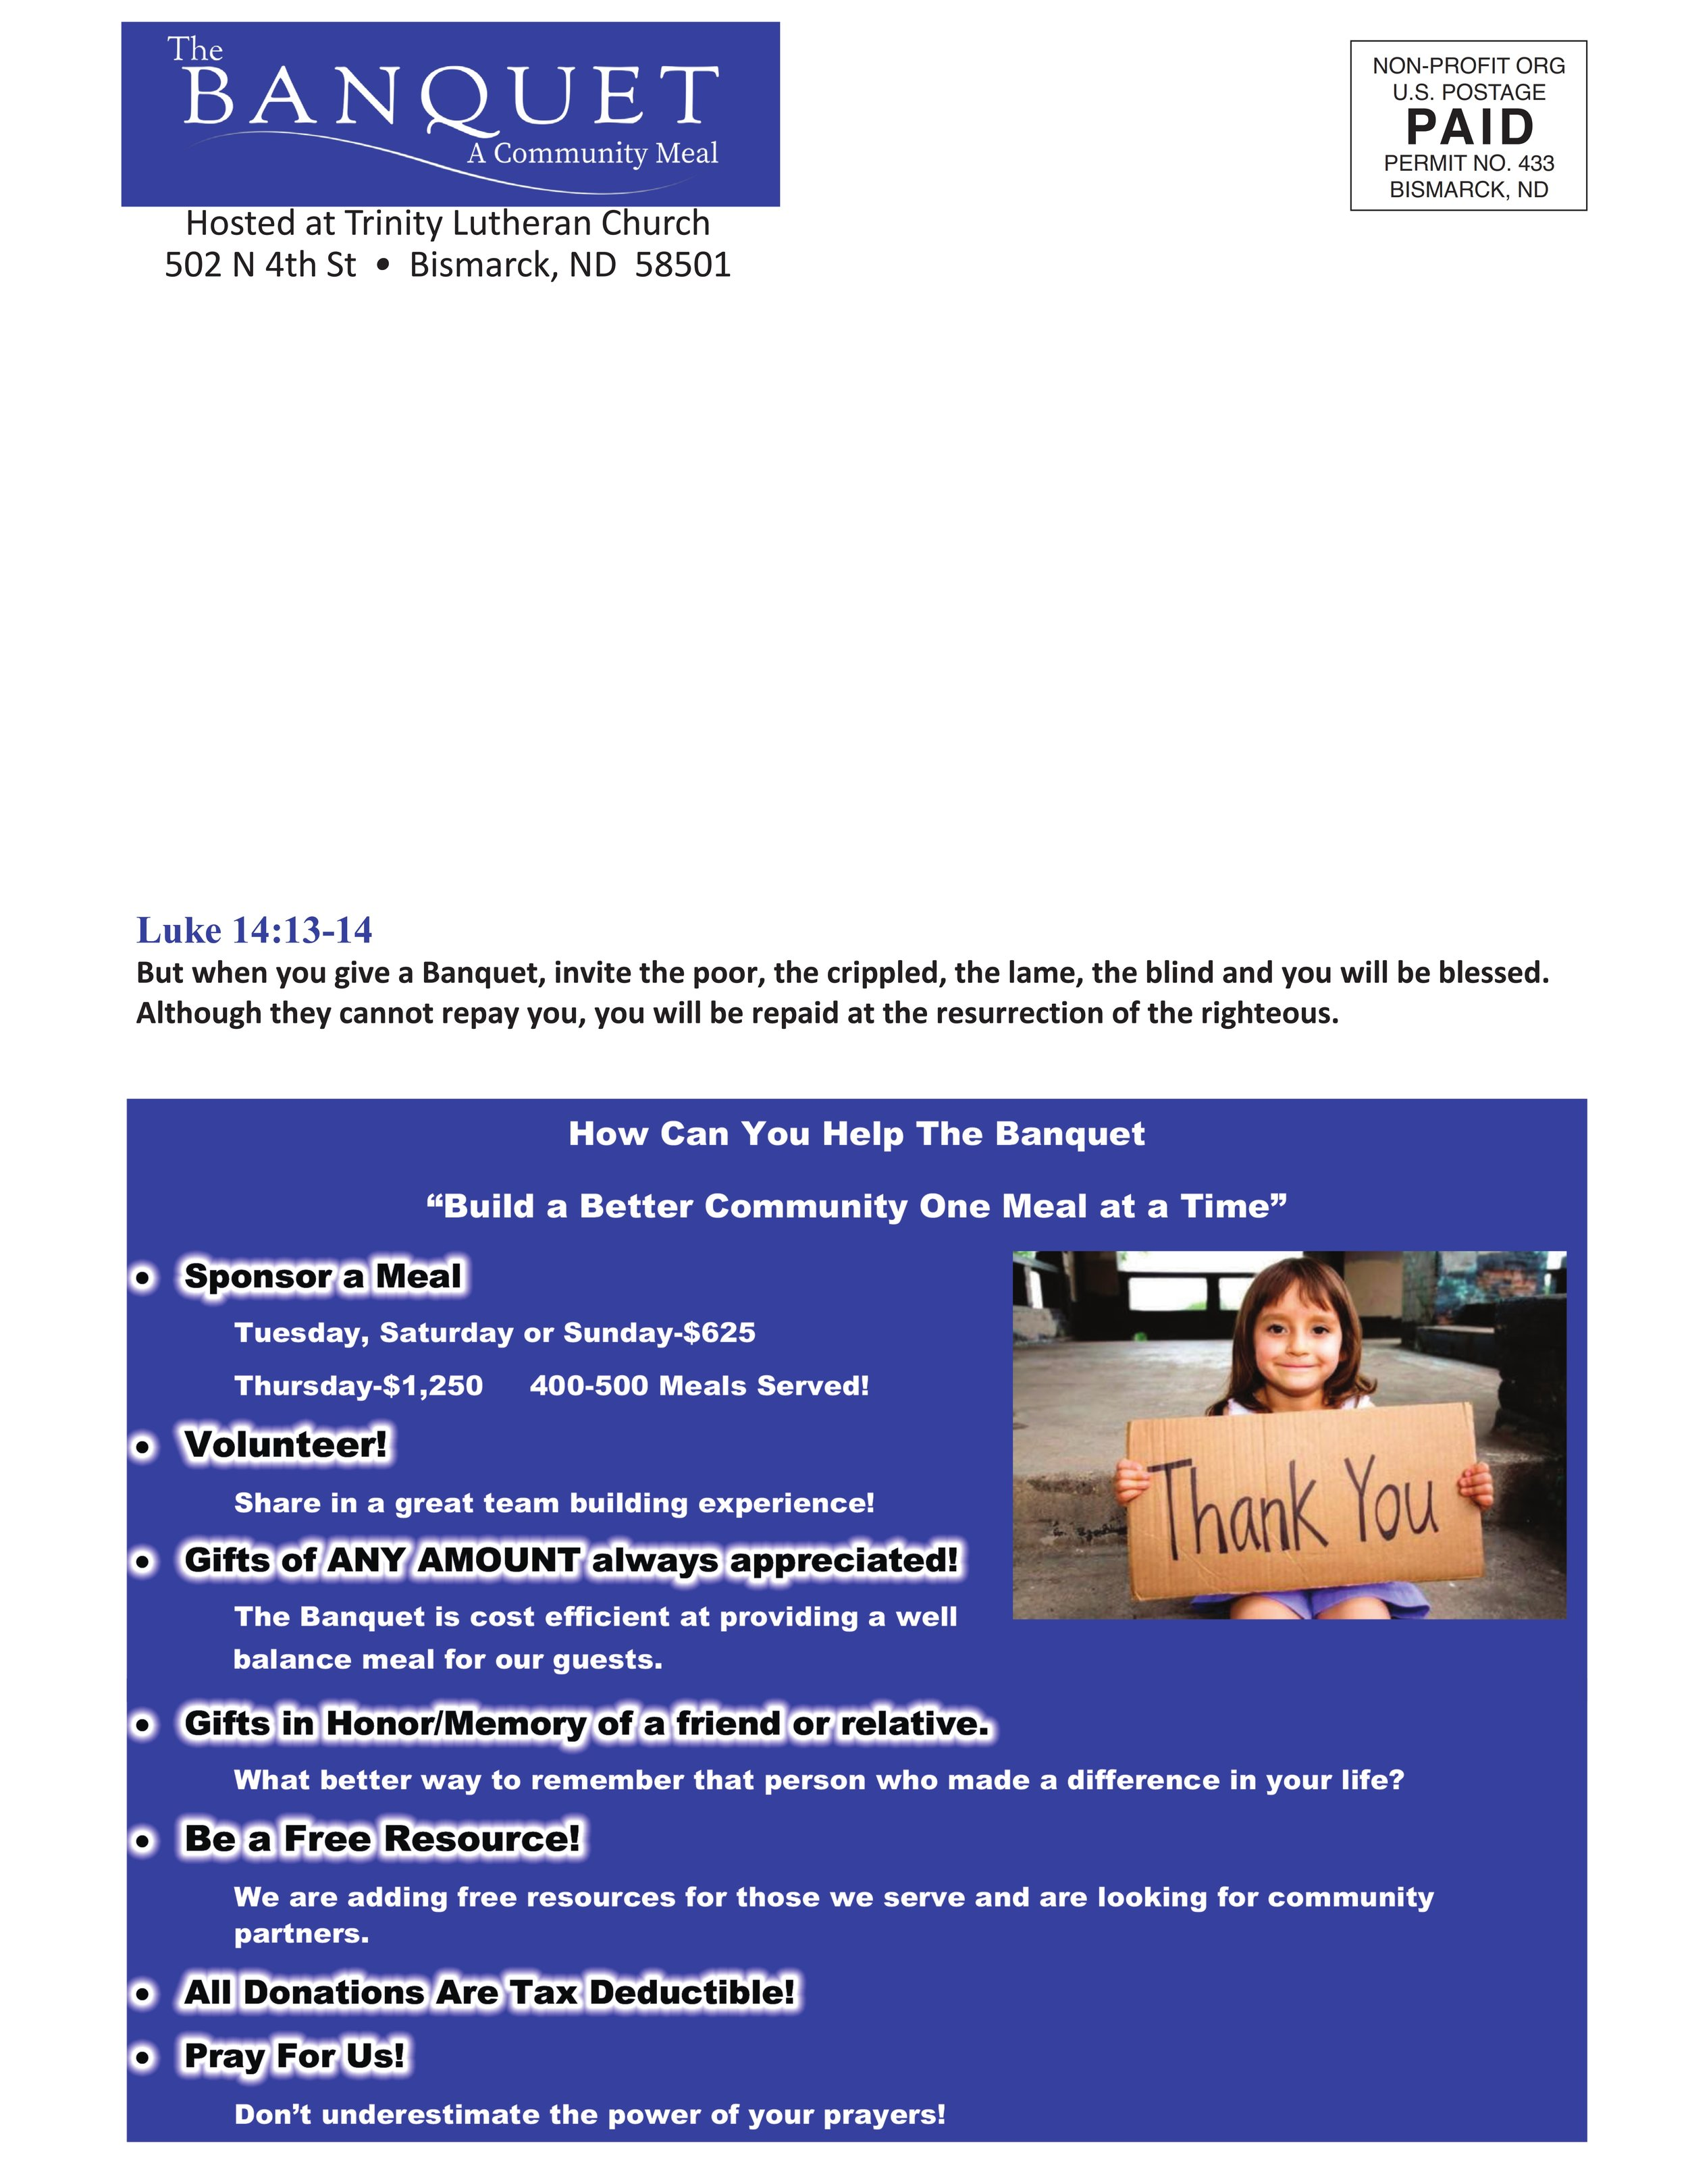 Banquet Newsletter Final Complete-Image Printing-Jan. 22, 2019_008.jpg